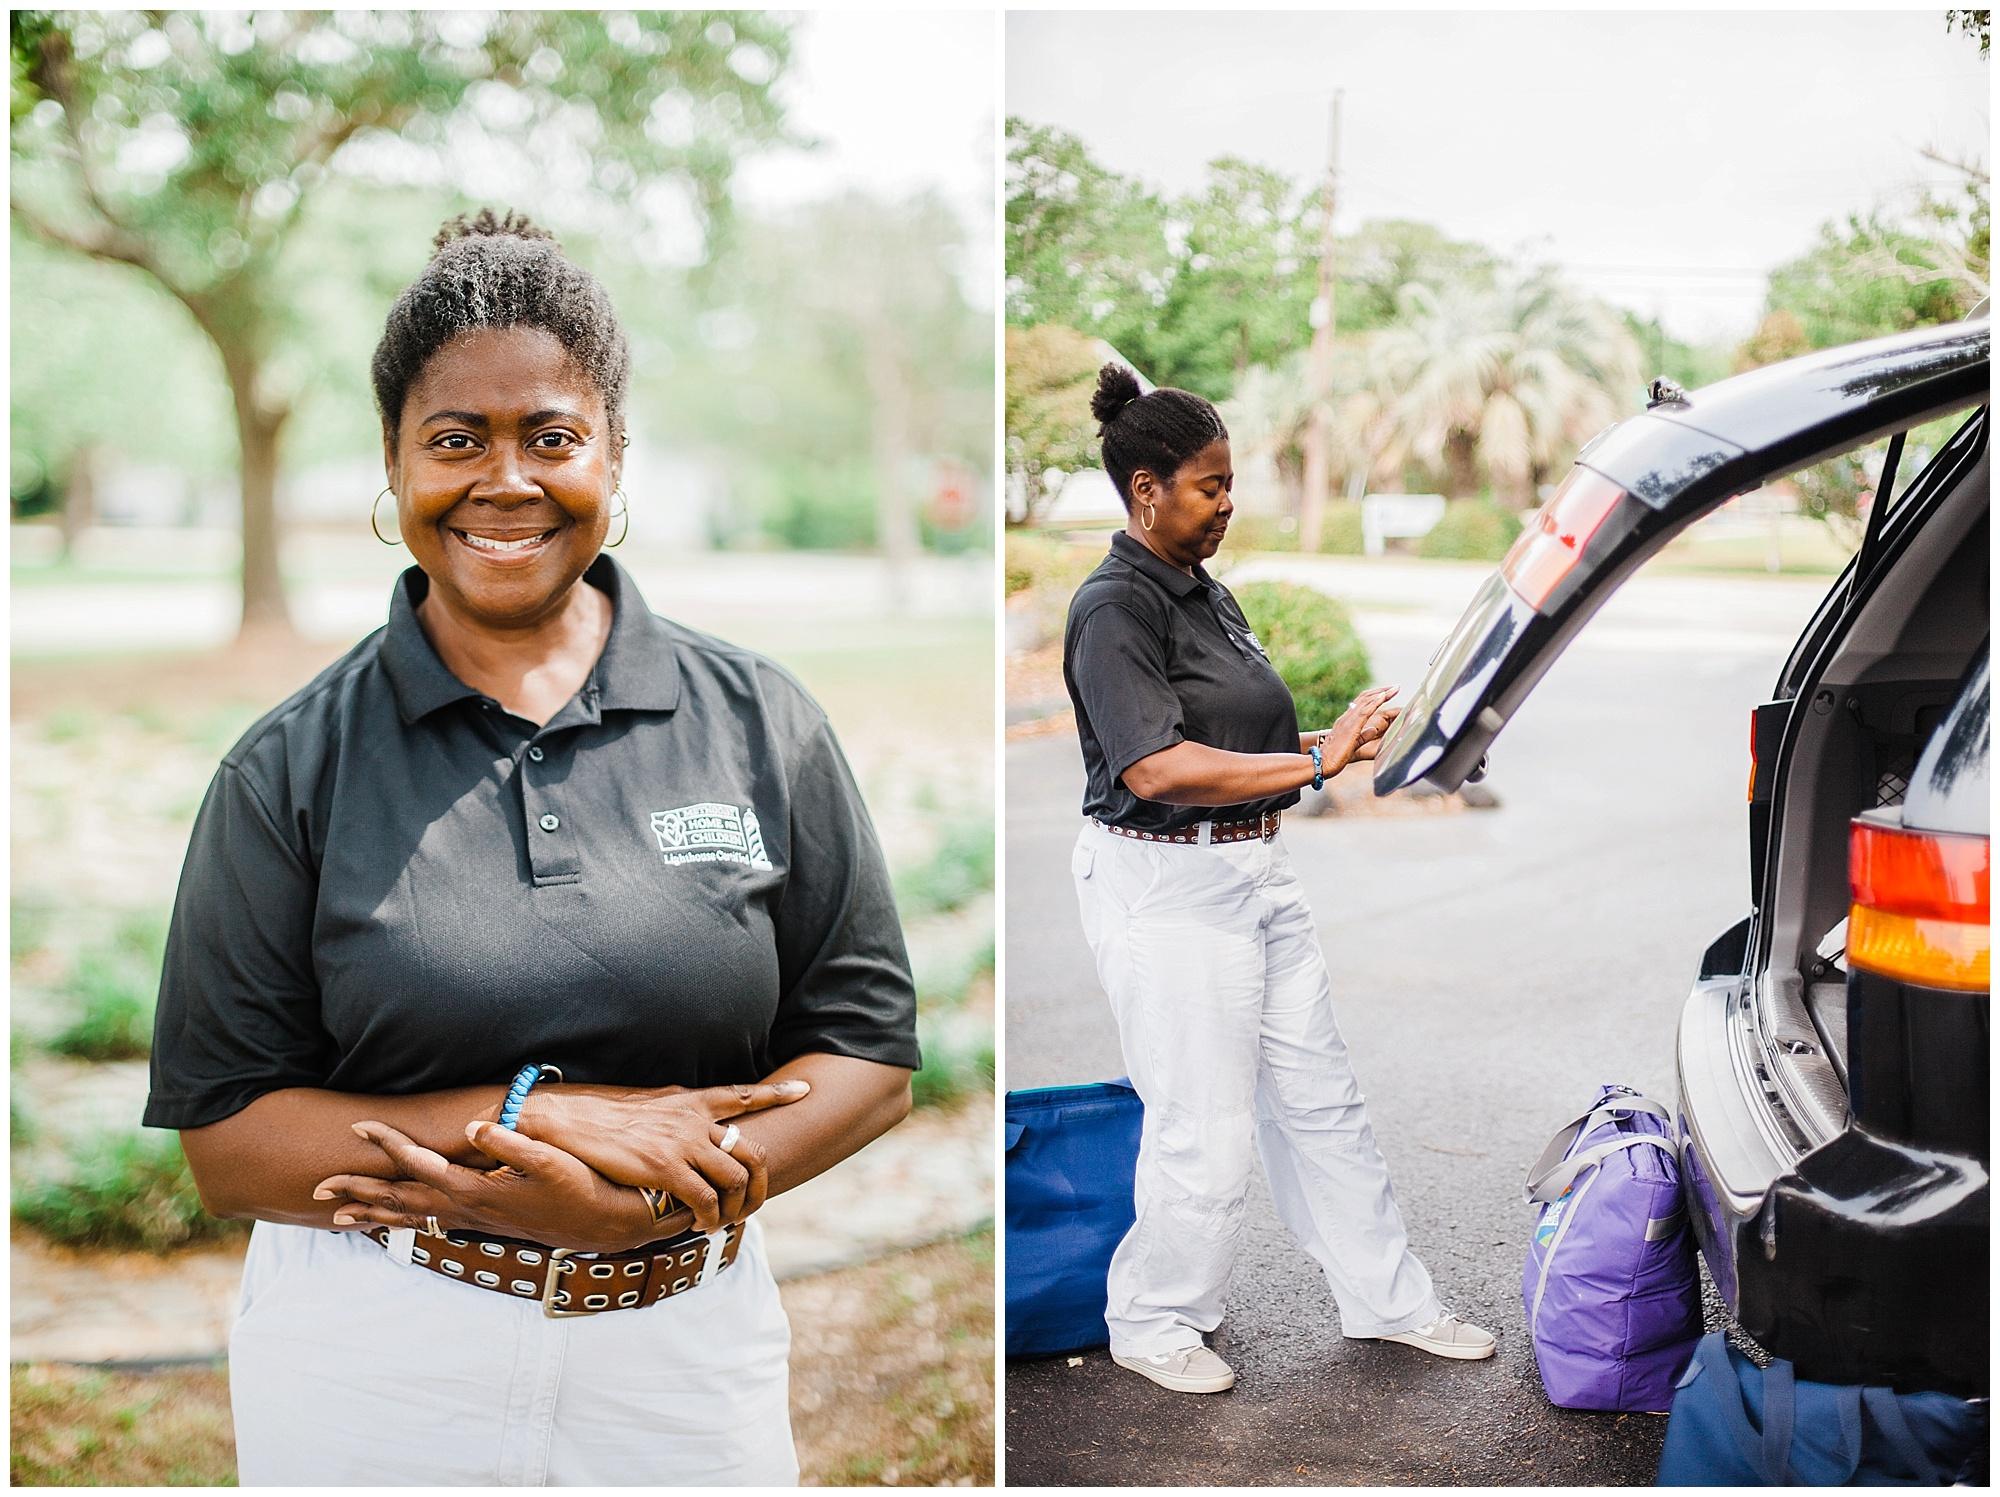 Nonprofit organization photographer